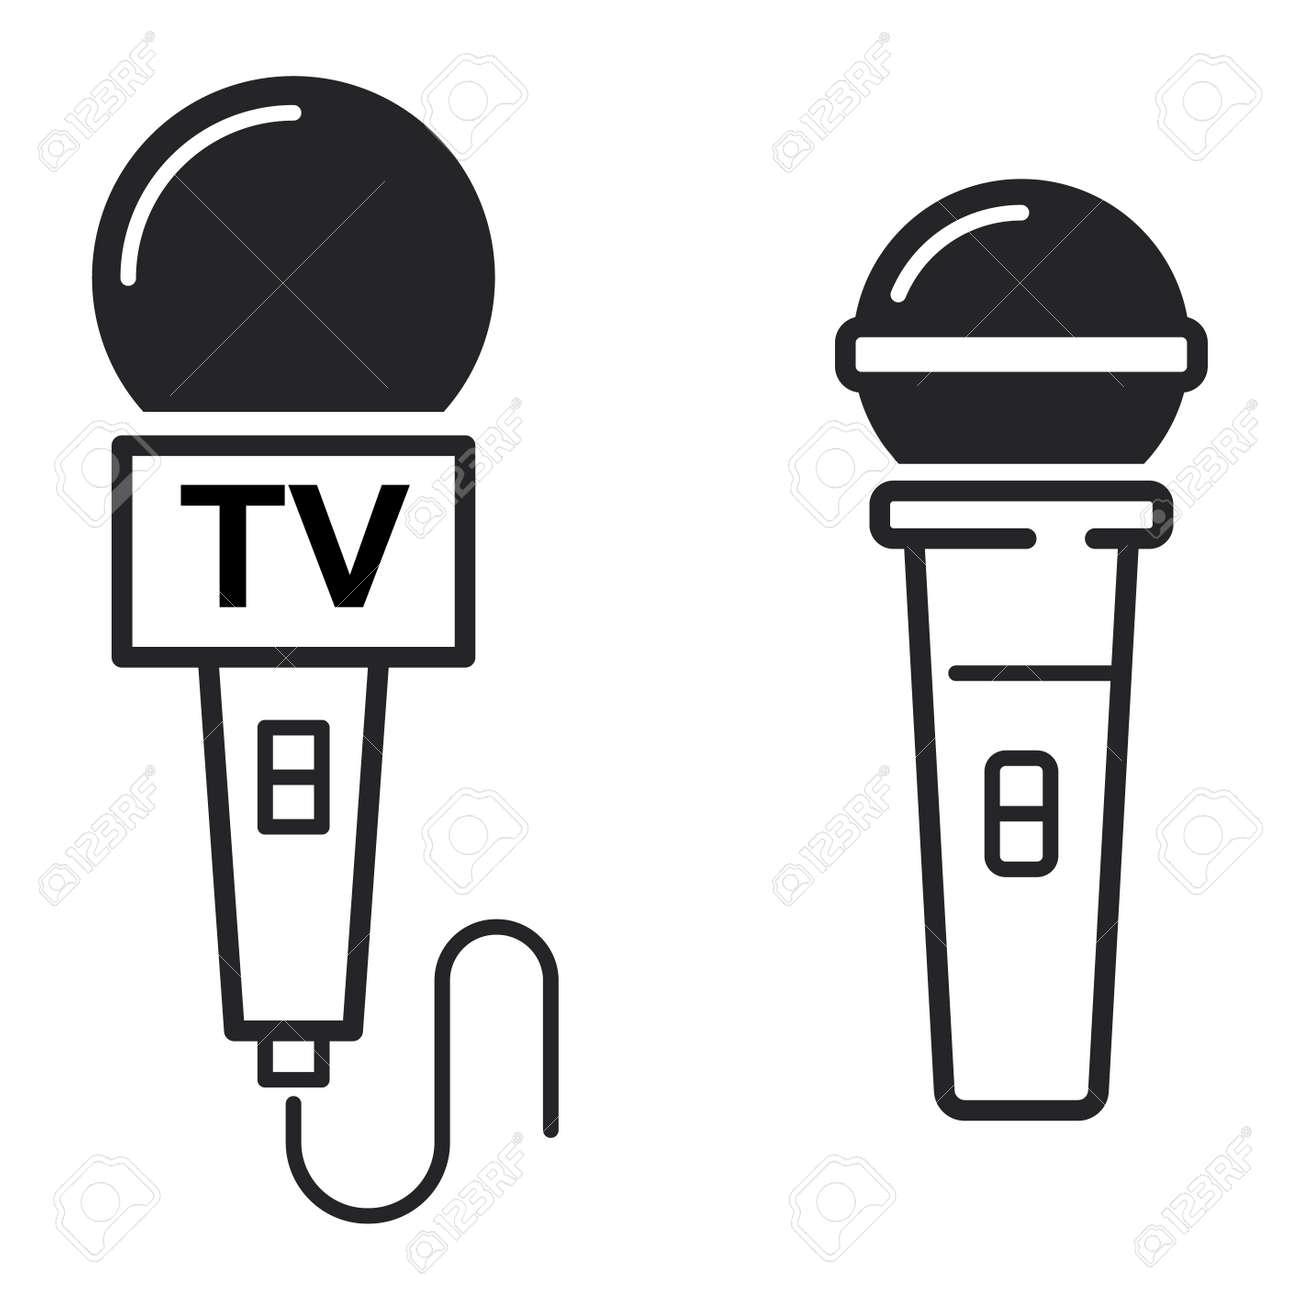 Gemütlich Symbol Mikrofon Fotos - Schaltplan Serie Circuit ...